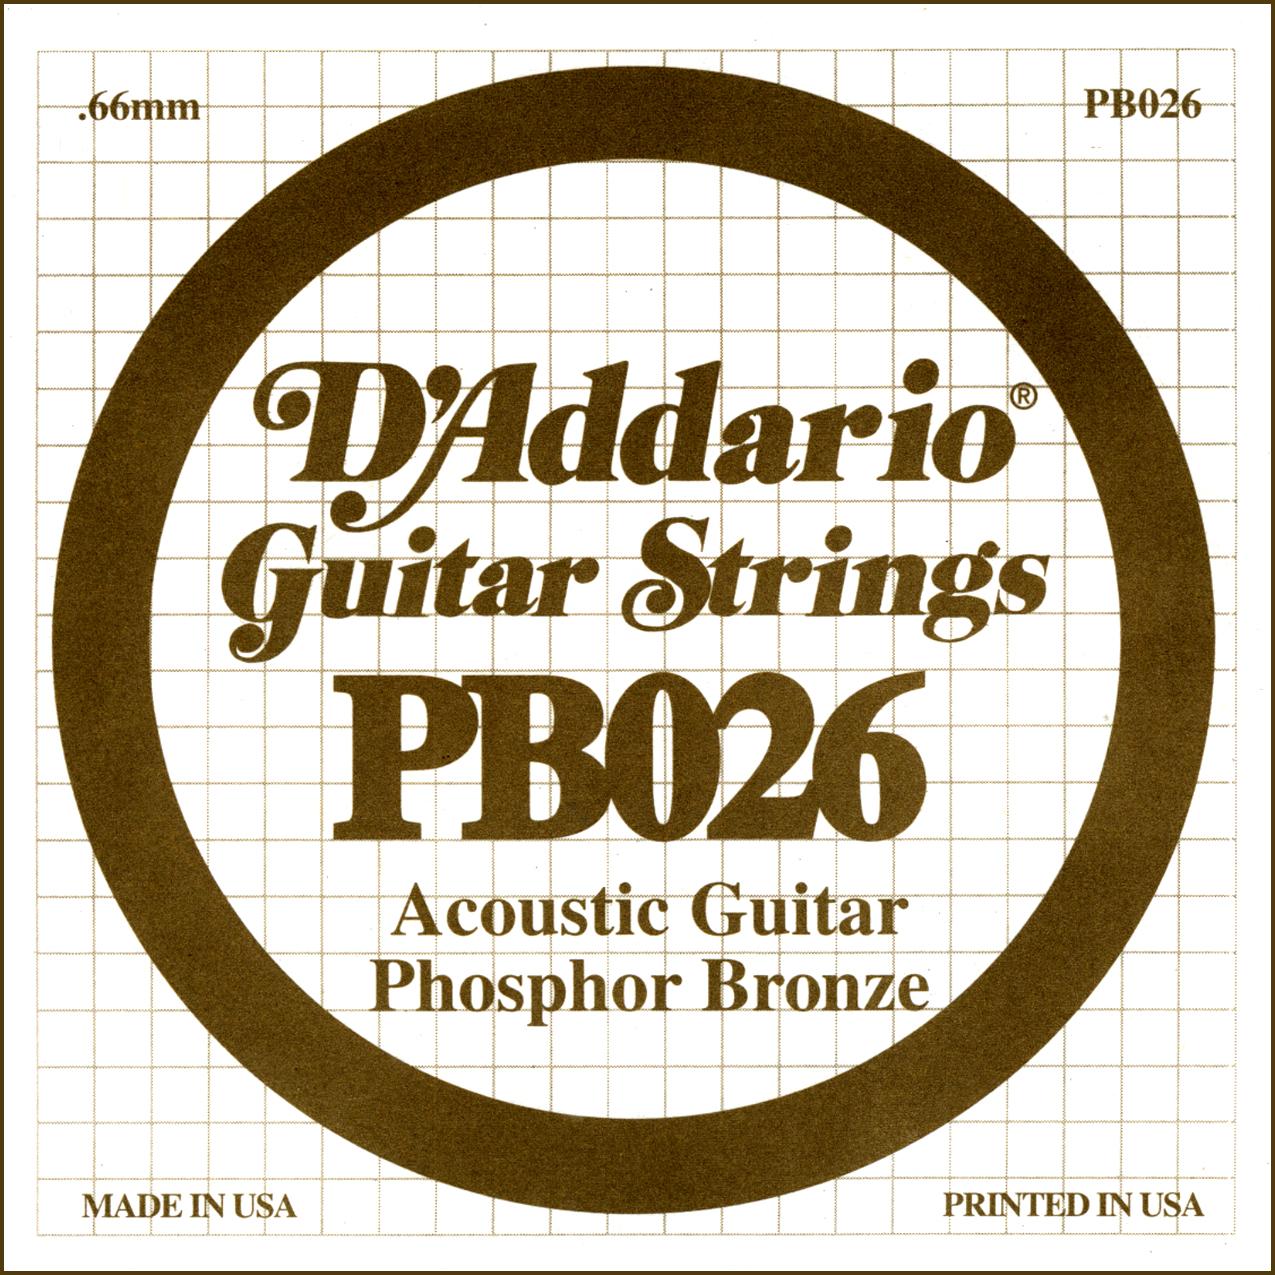 D'Addario Single Strings PBO26